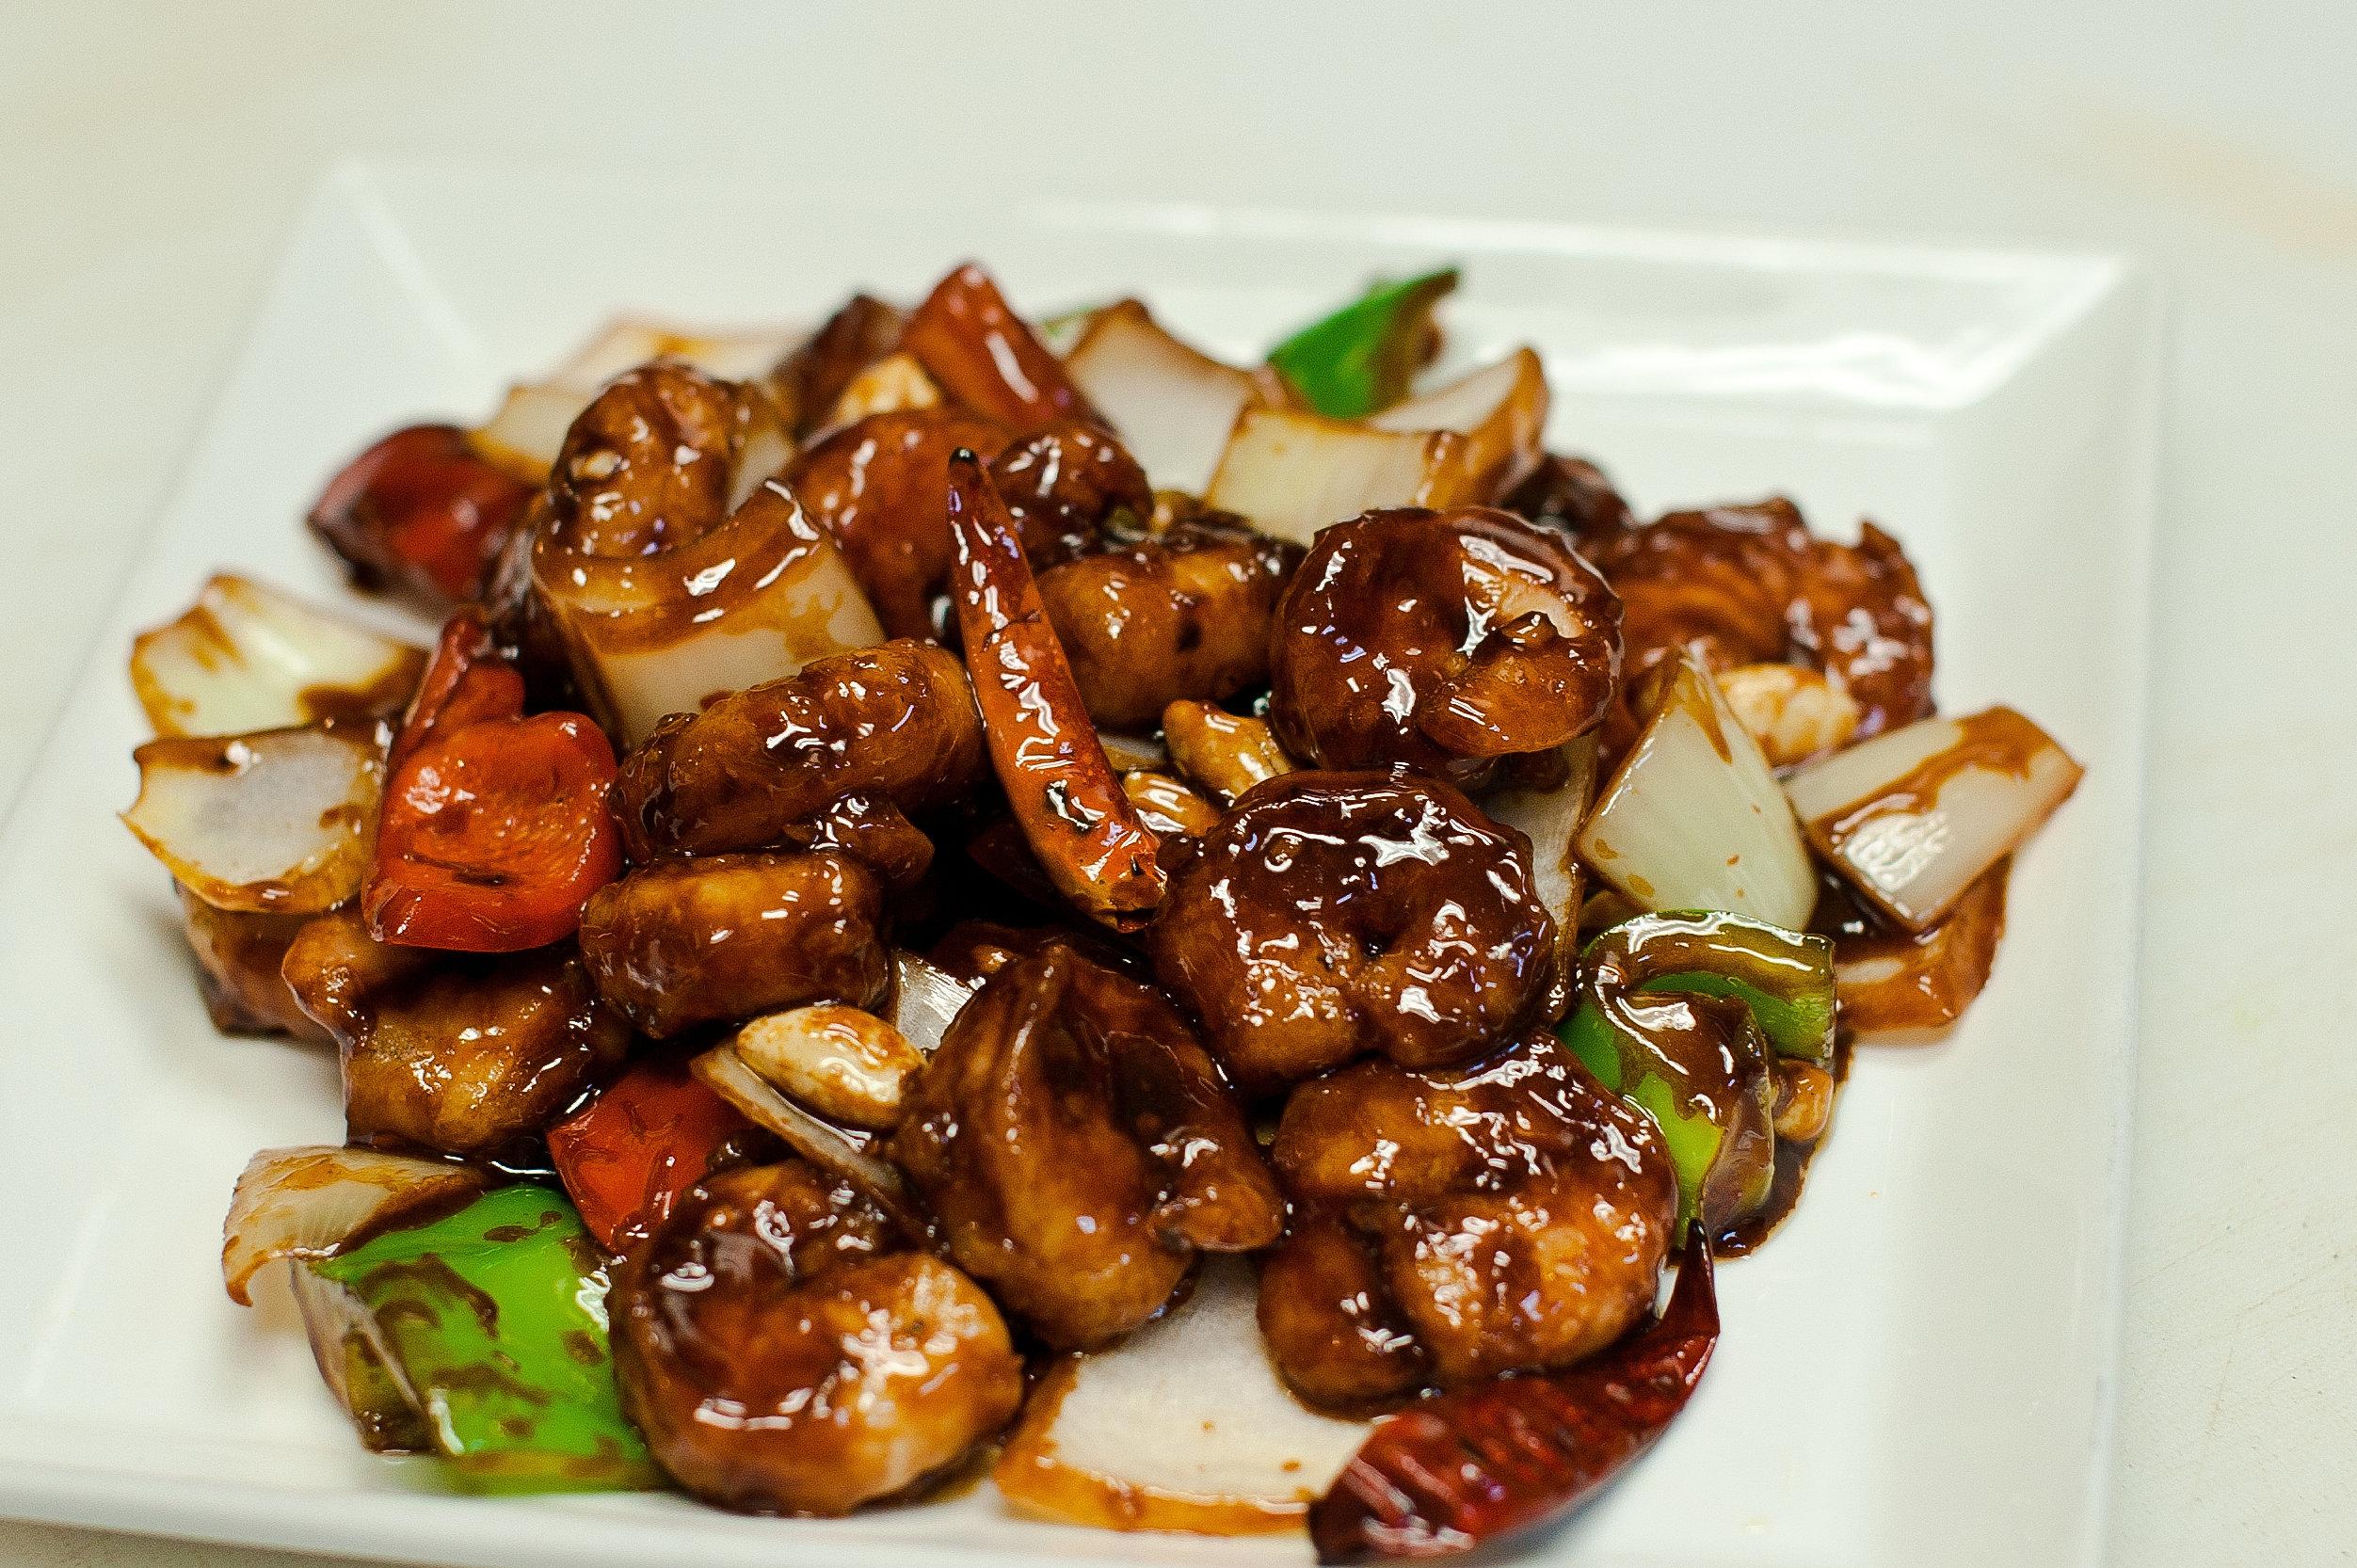 Go China Restaurant | Chinese Food | Kung Pao Shrimp